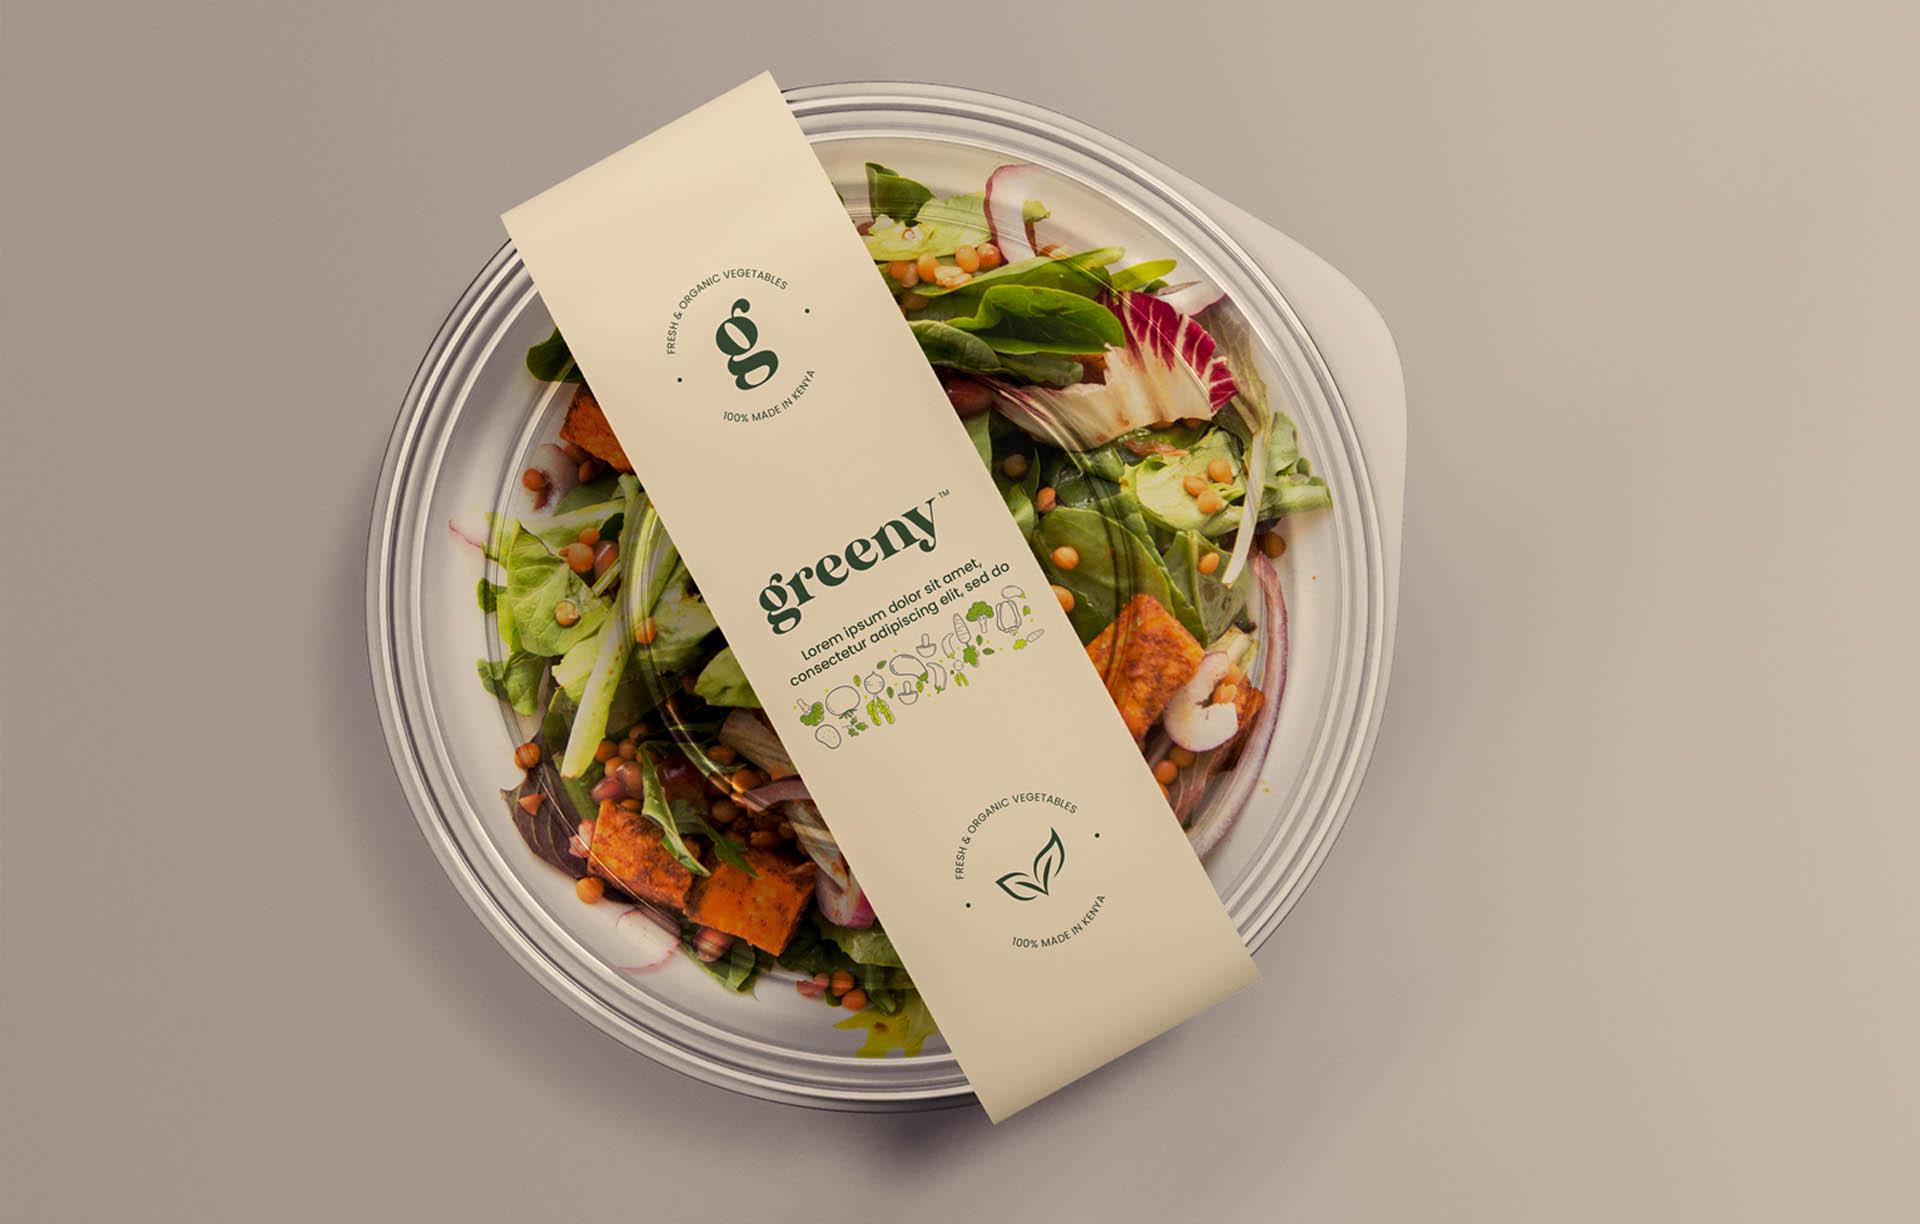 Greeny salad food packaging sample